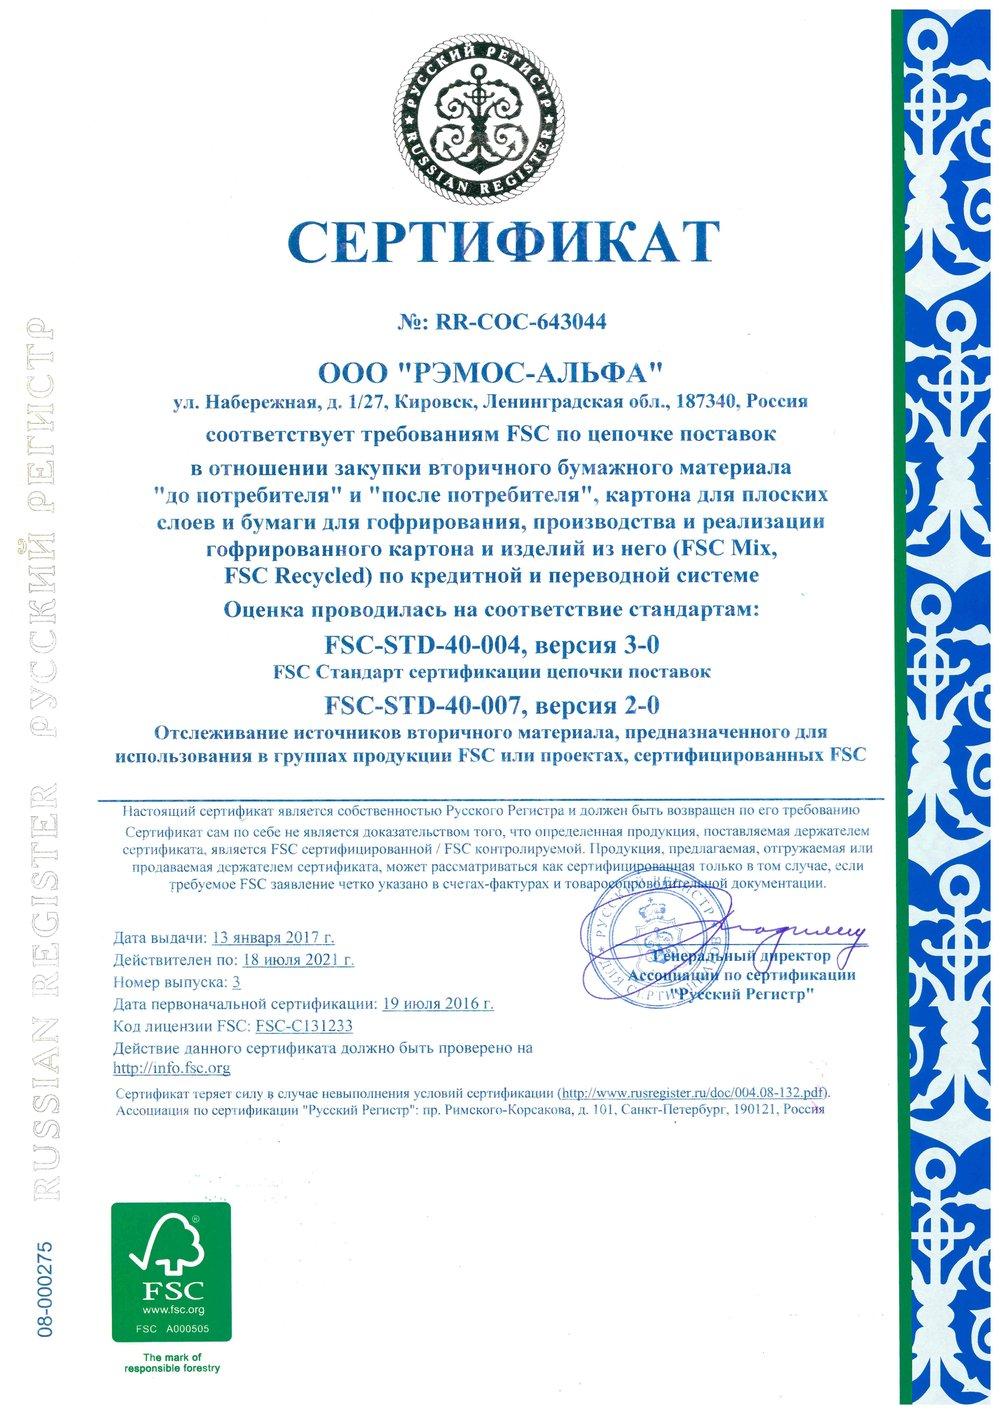 Скан срертиф V3  20 12 2017 rus.jpg